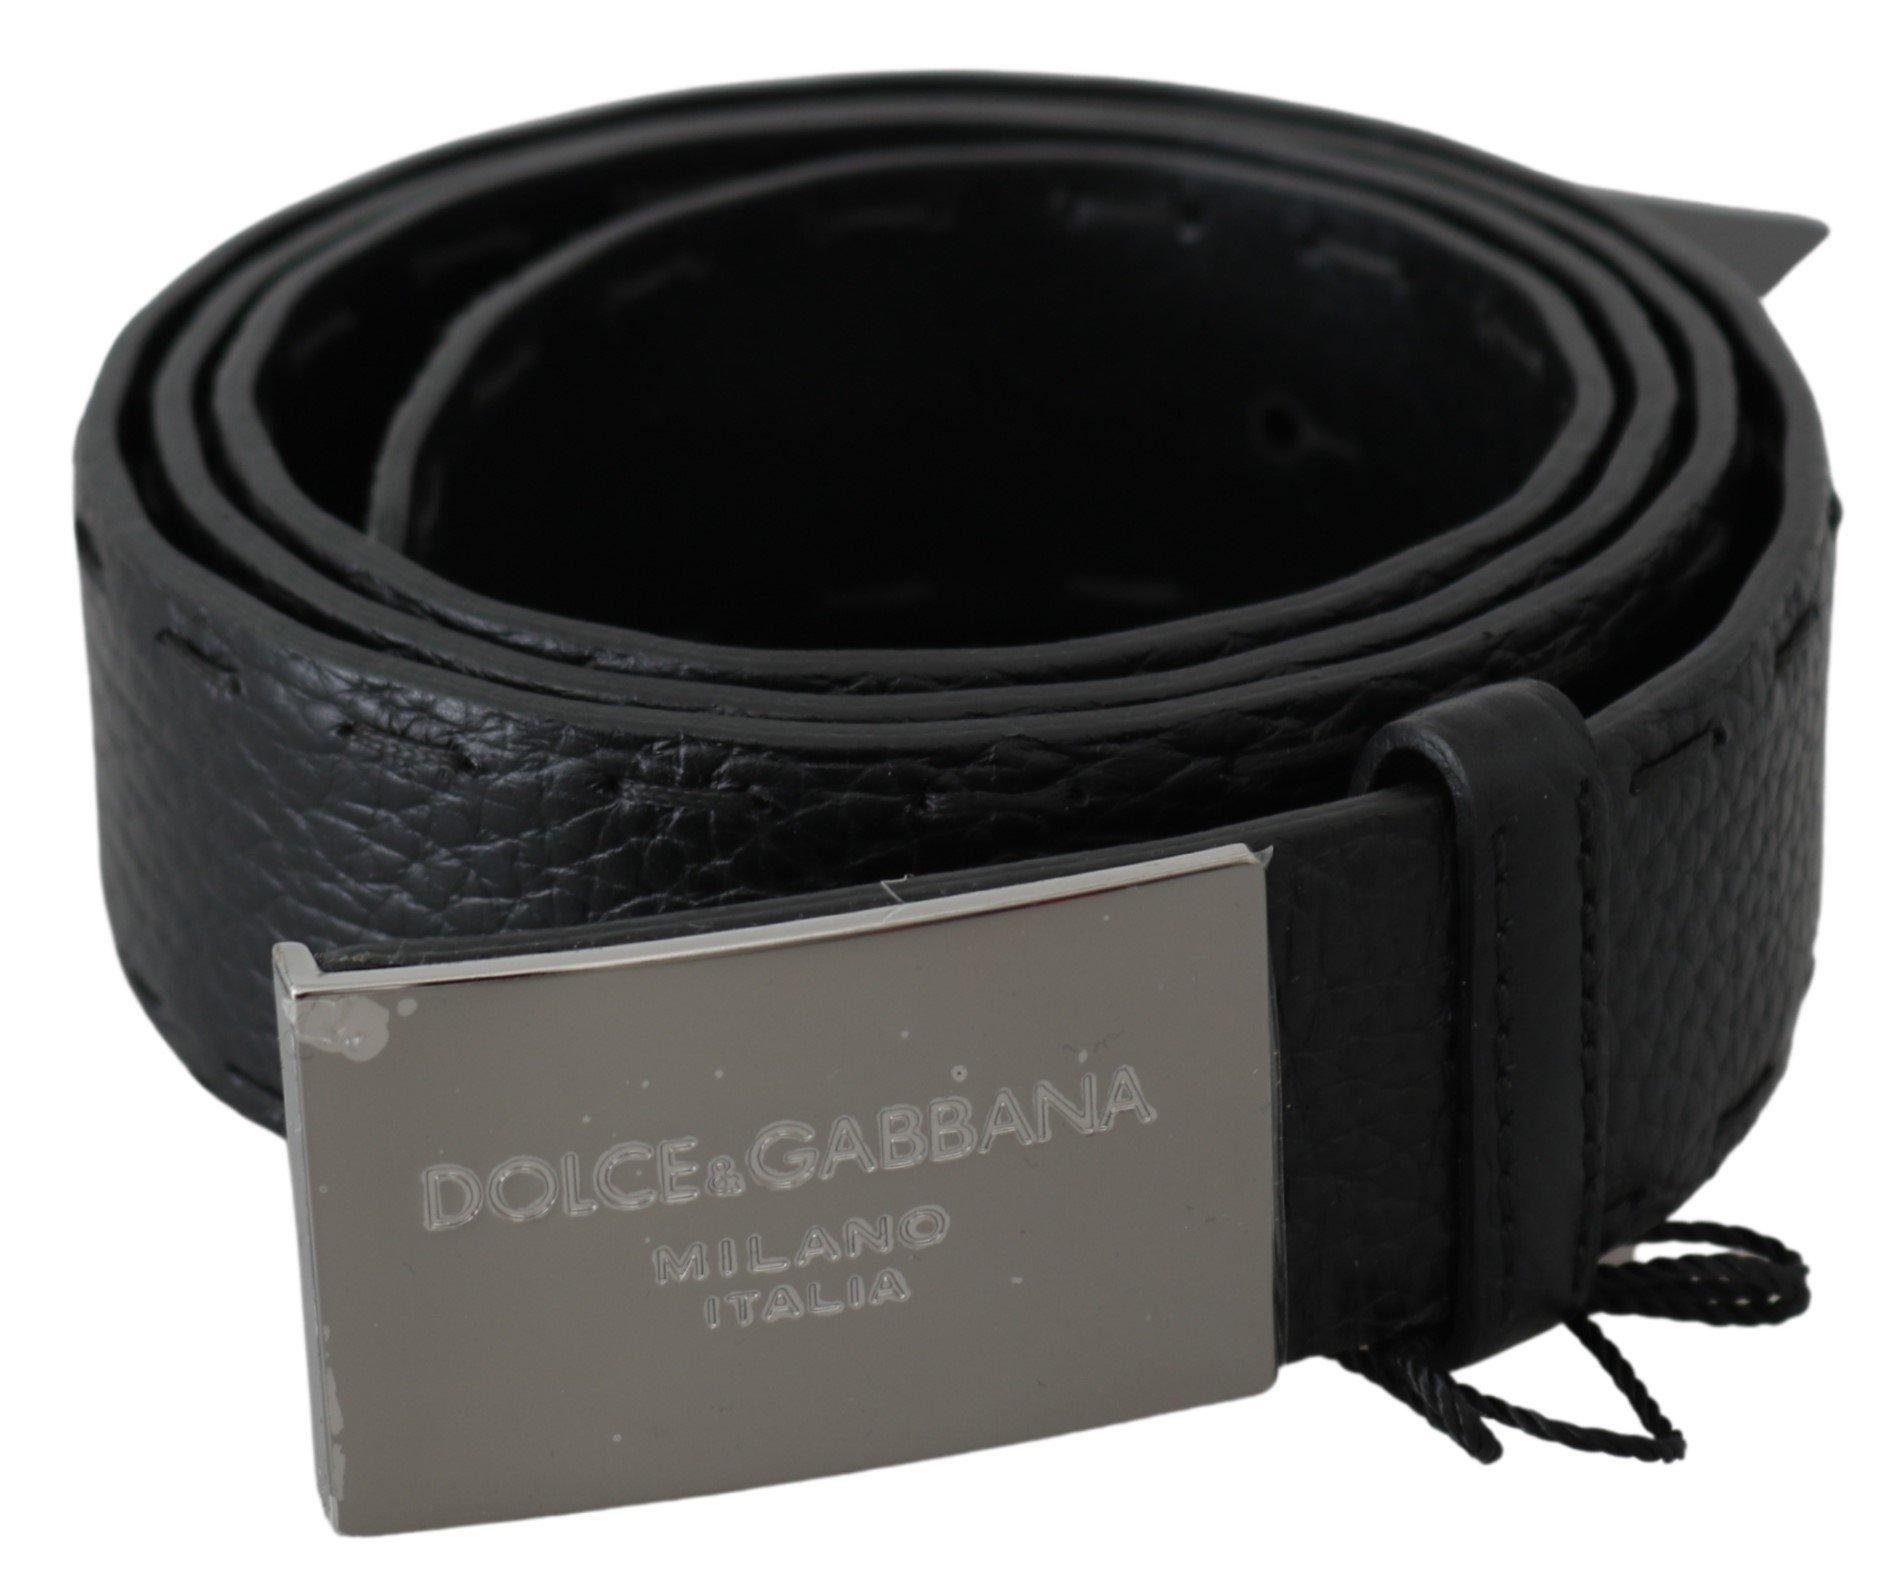 Dolce & Gabbana Men's Pattern Leather DG Logo Buckle Belt Black BEL60670 - 100 cm / 40 Inches